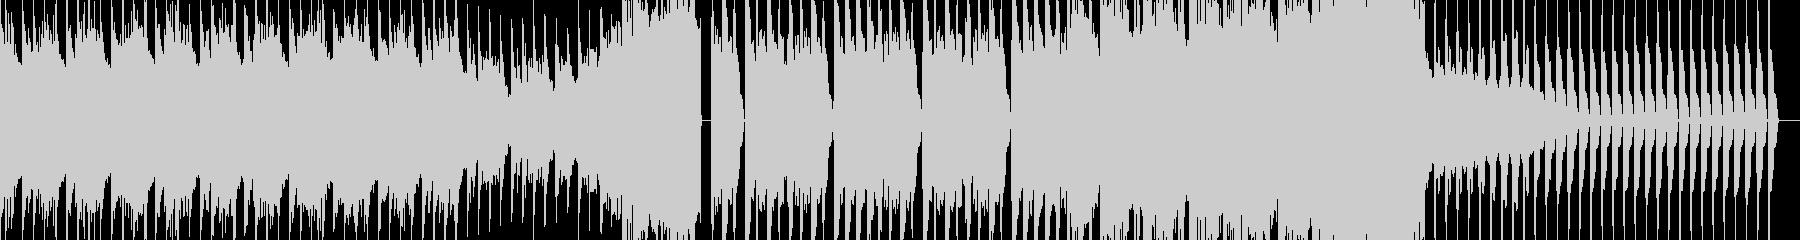 【EDM】力強く、アグレッシブなナンバーの未再生の波形